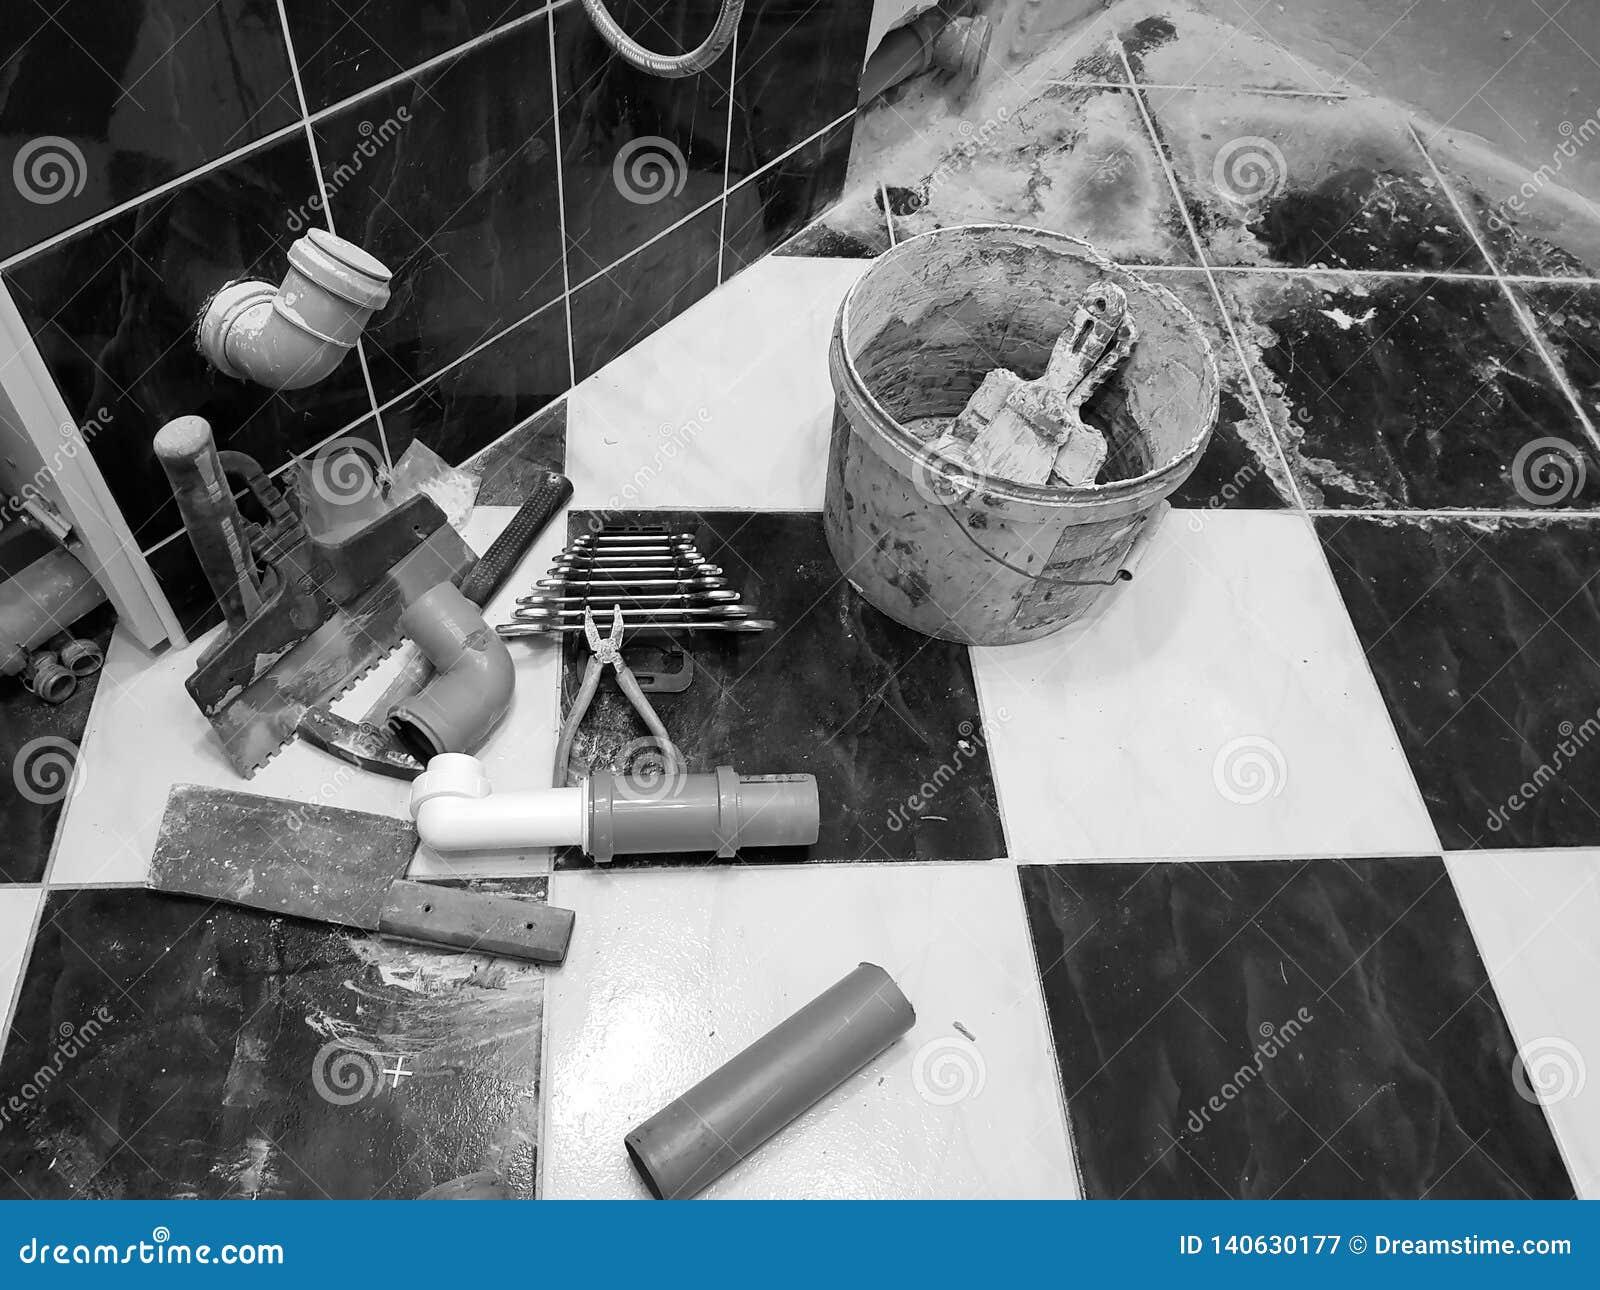 Repair - building with tools hammer, sledgehammer, pliers and keys